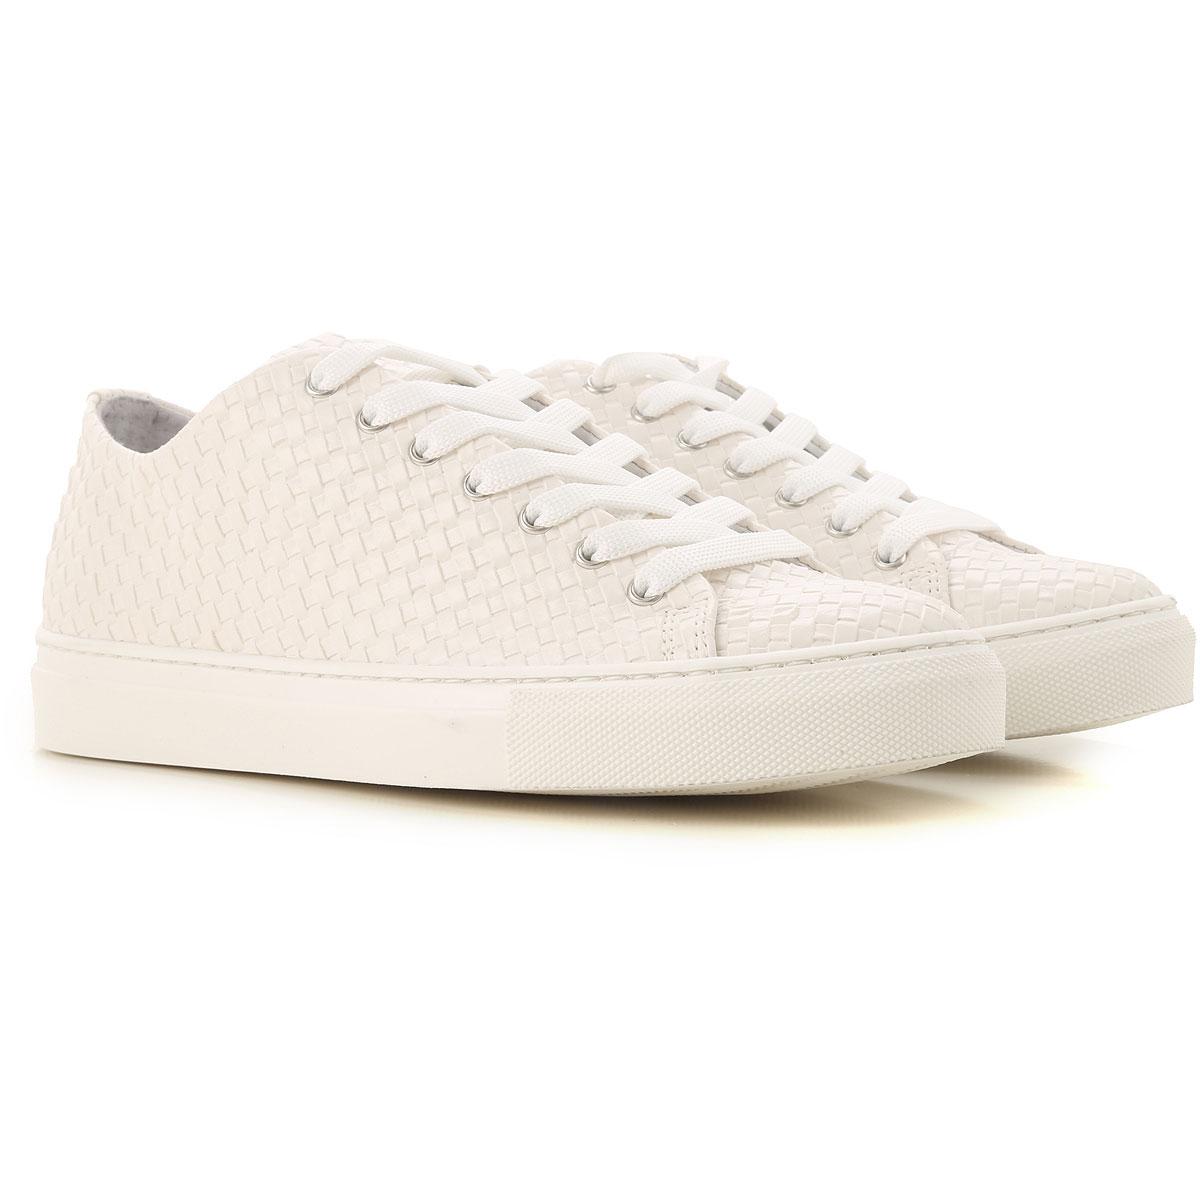 Daniele Alessandrini Sneaker Homme, Blanc, Cuir, 2017, 40 41 42